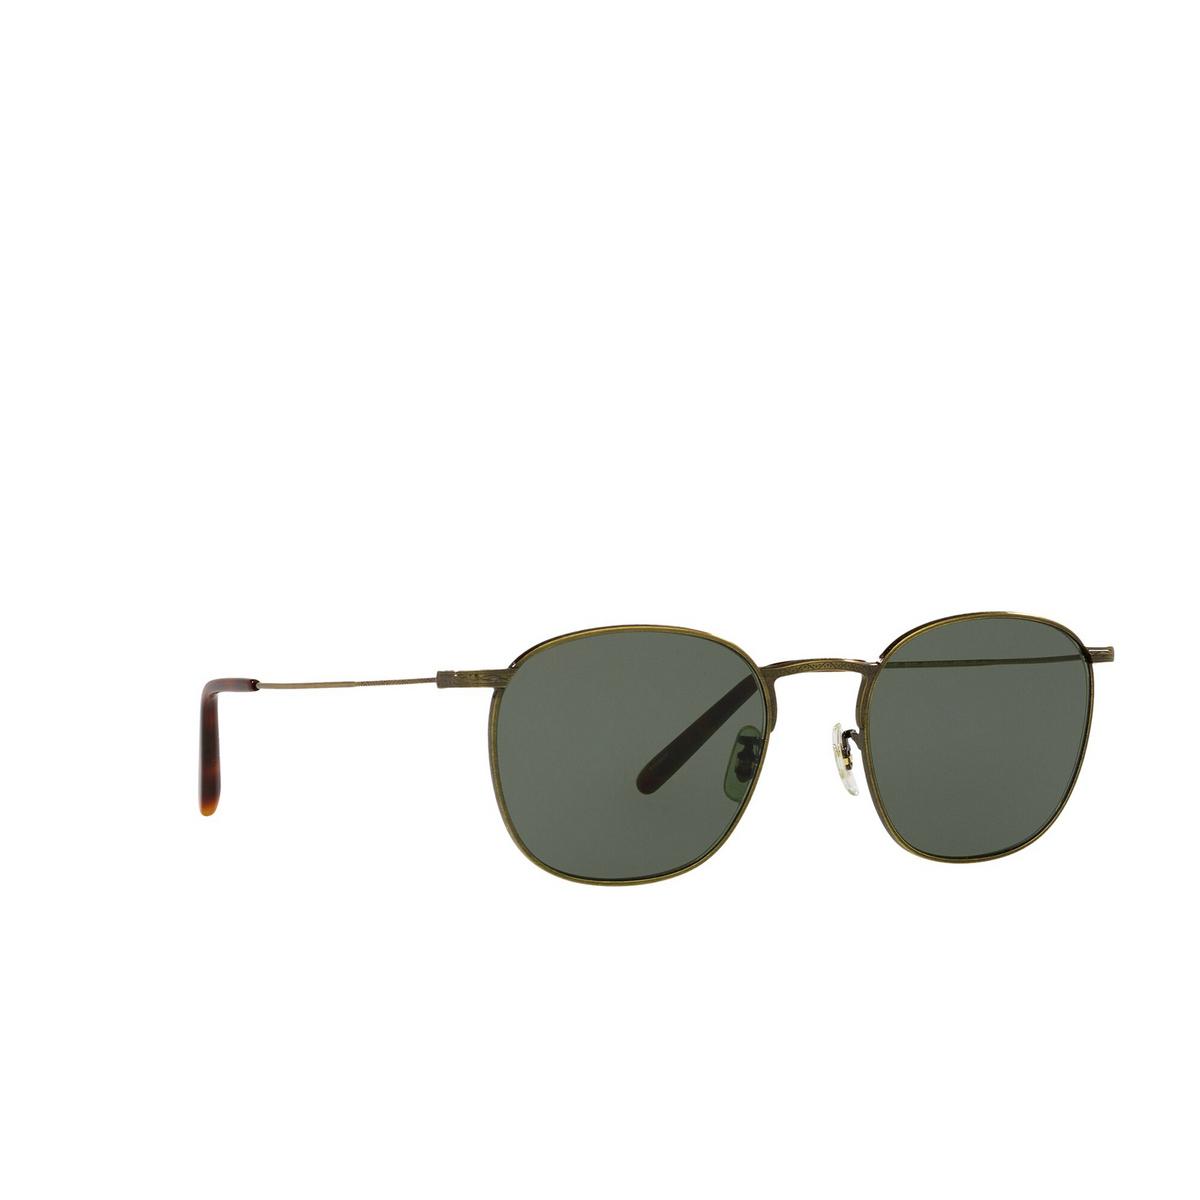 Oliver Peoples® Square Sunglasses: Goldsen Sun OV1285ST color Antique Gold 528452 - three-quarters view.